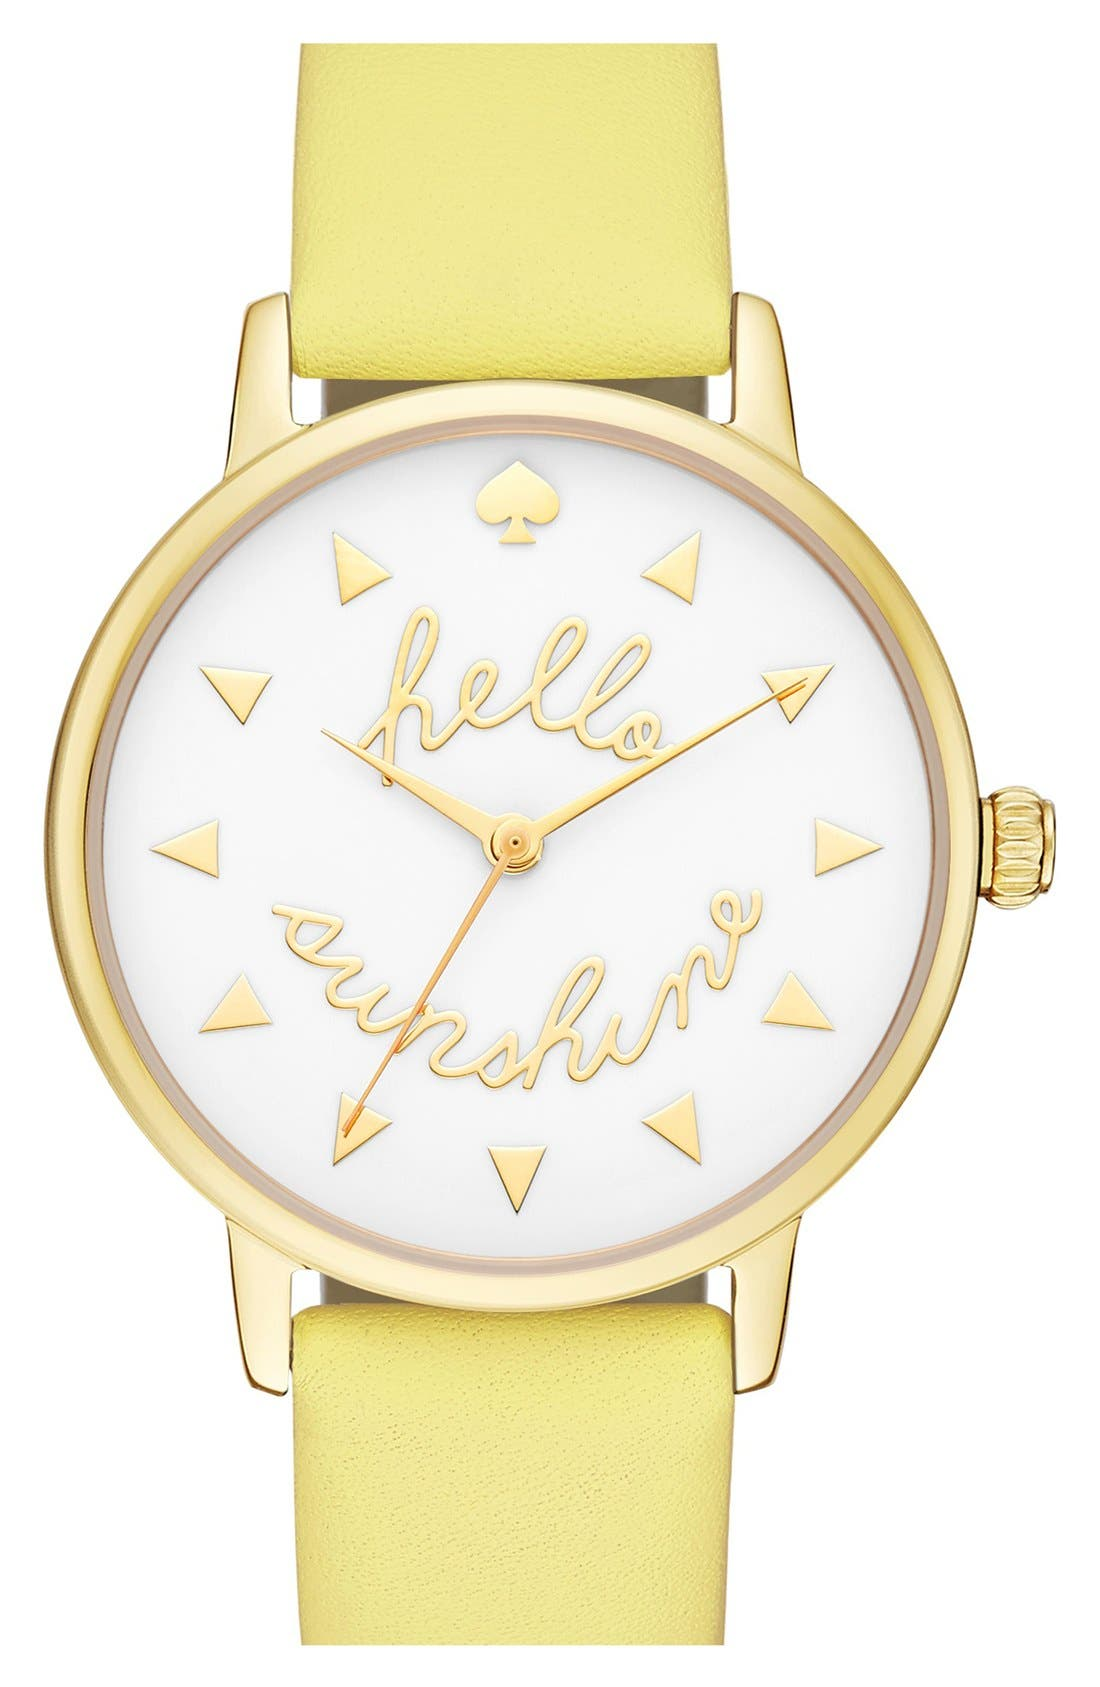 Alternate Image 1 Selected - kate spade new york 'metro - sunshine' leather strap watch, 34mm